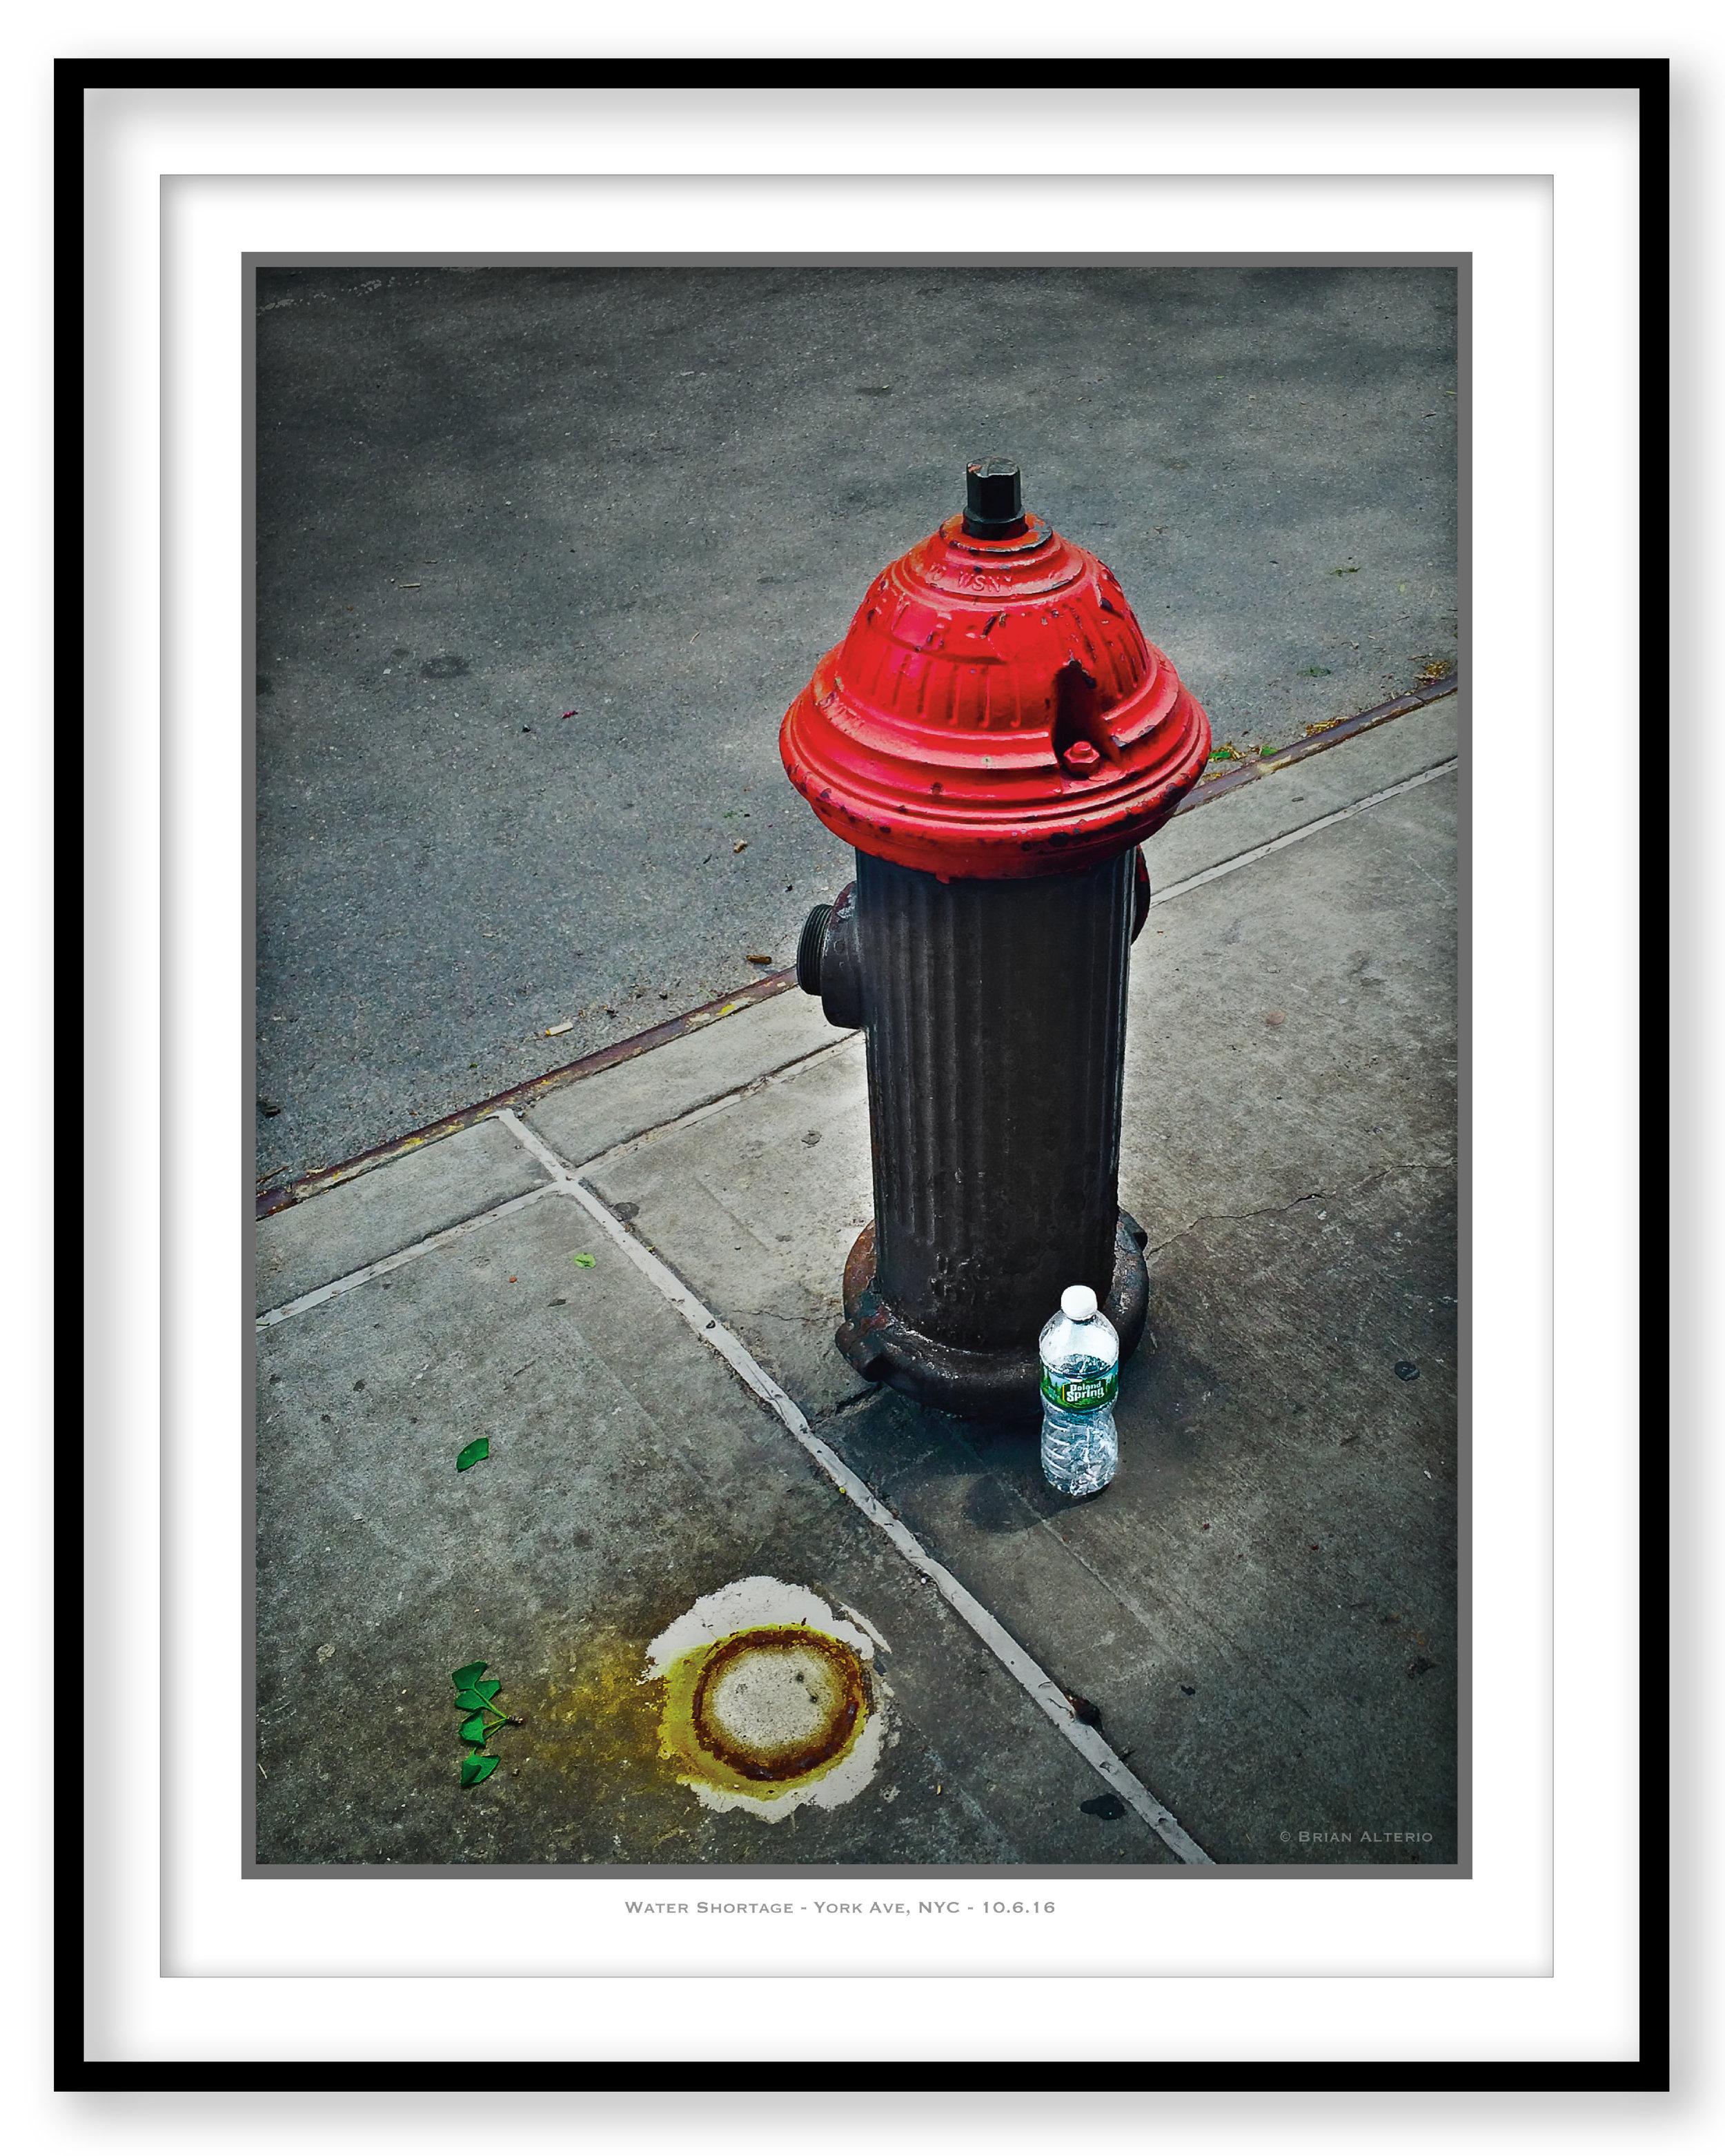 Water Shortage - York Ave, NYC - 10.6.16 - Framed.jpg